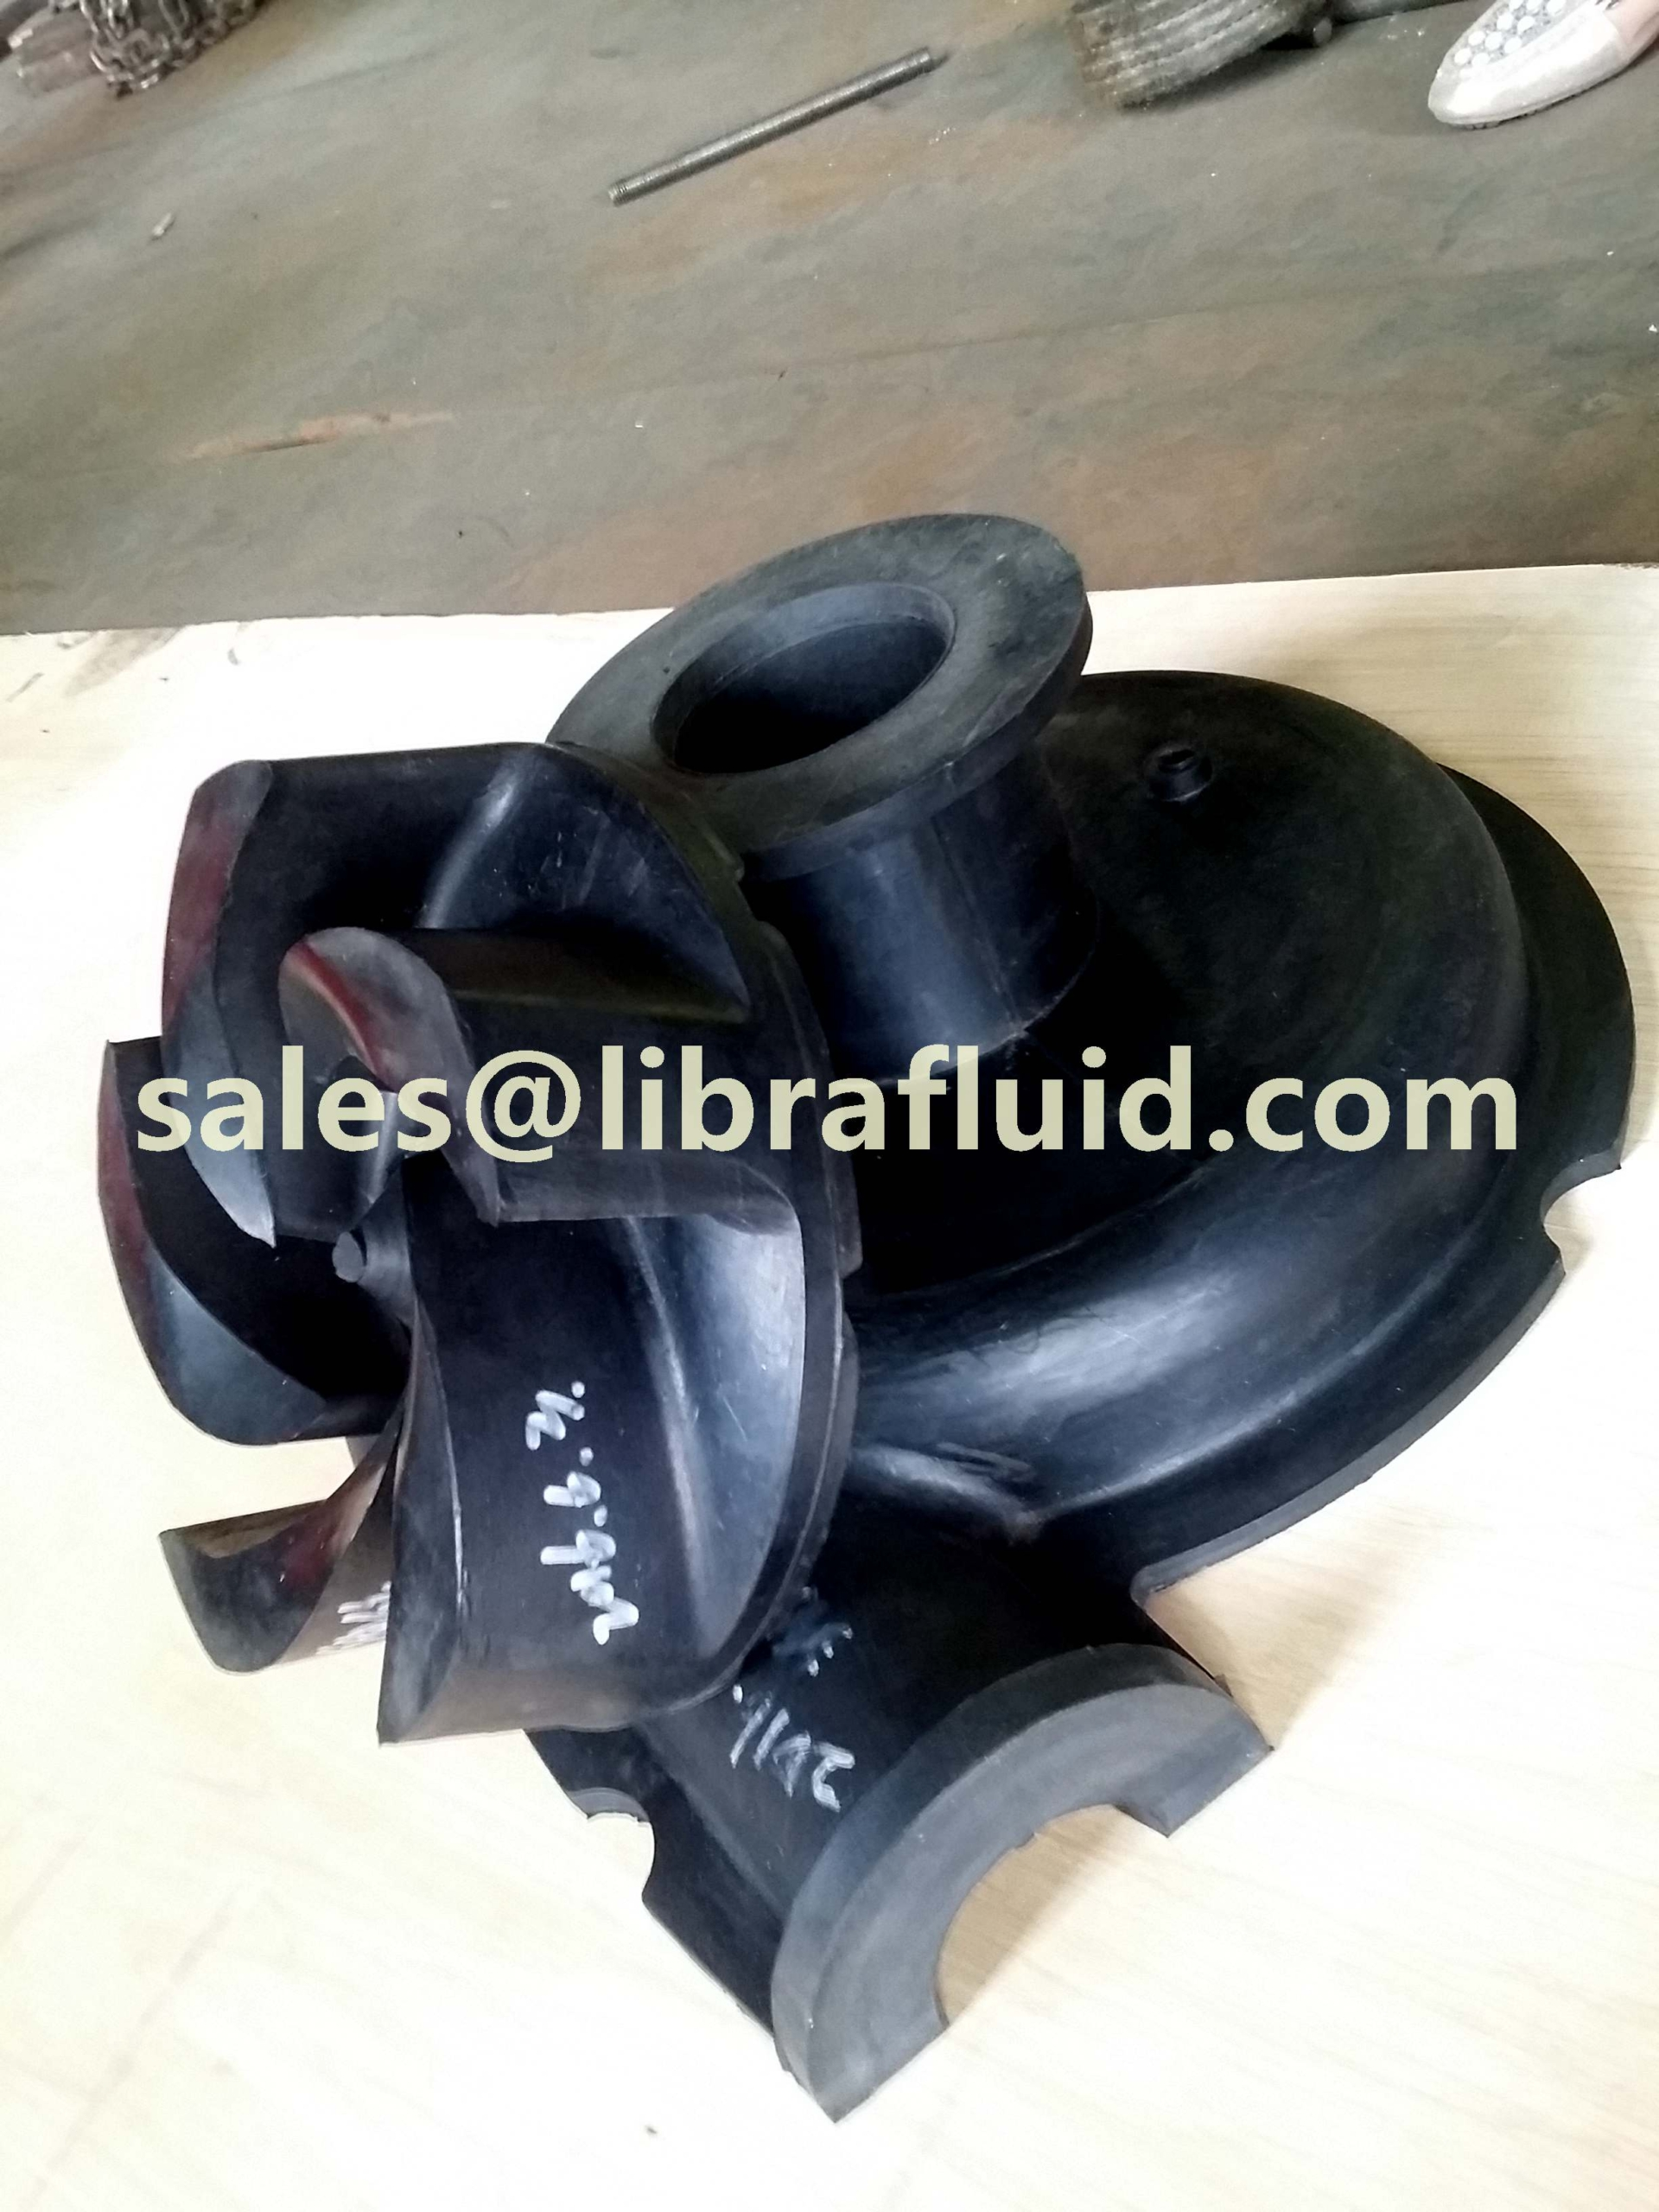 3x2 slurry pump impeller and liner